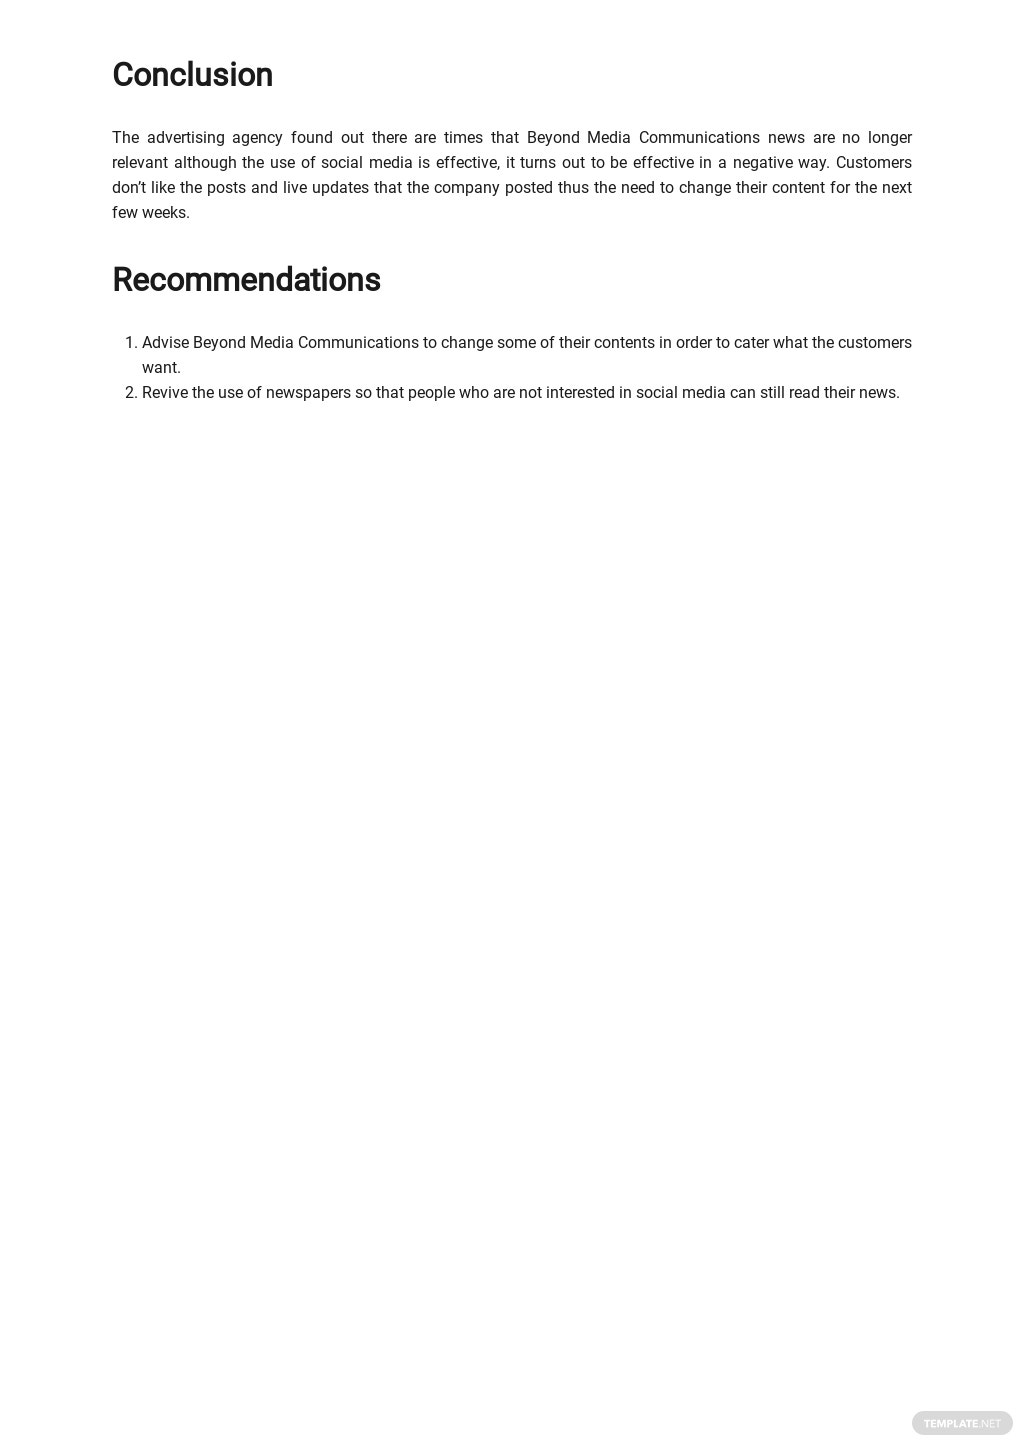 Free Sample Advertising Agency Report Template 3.jpe